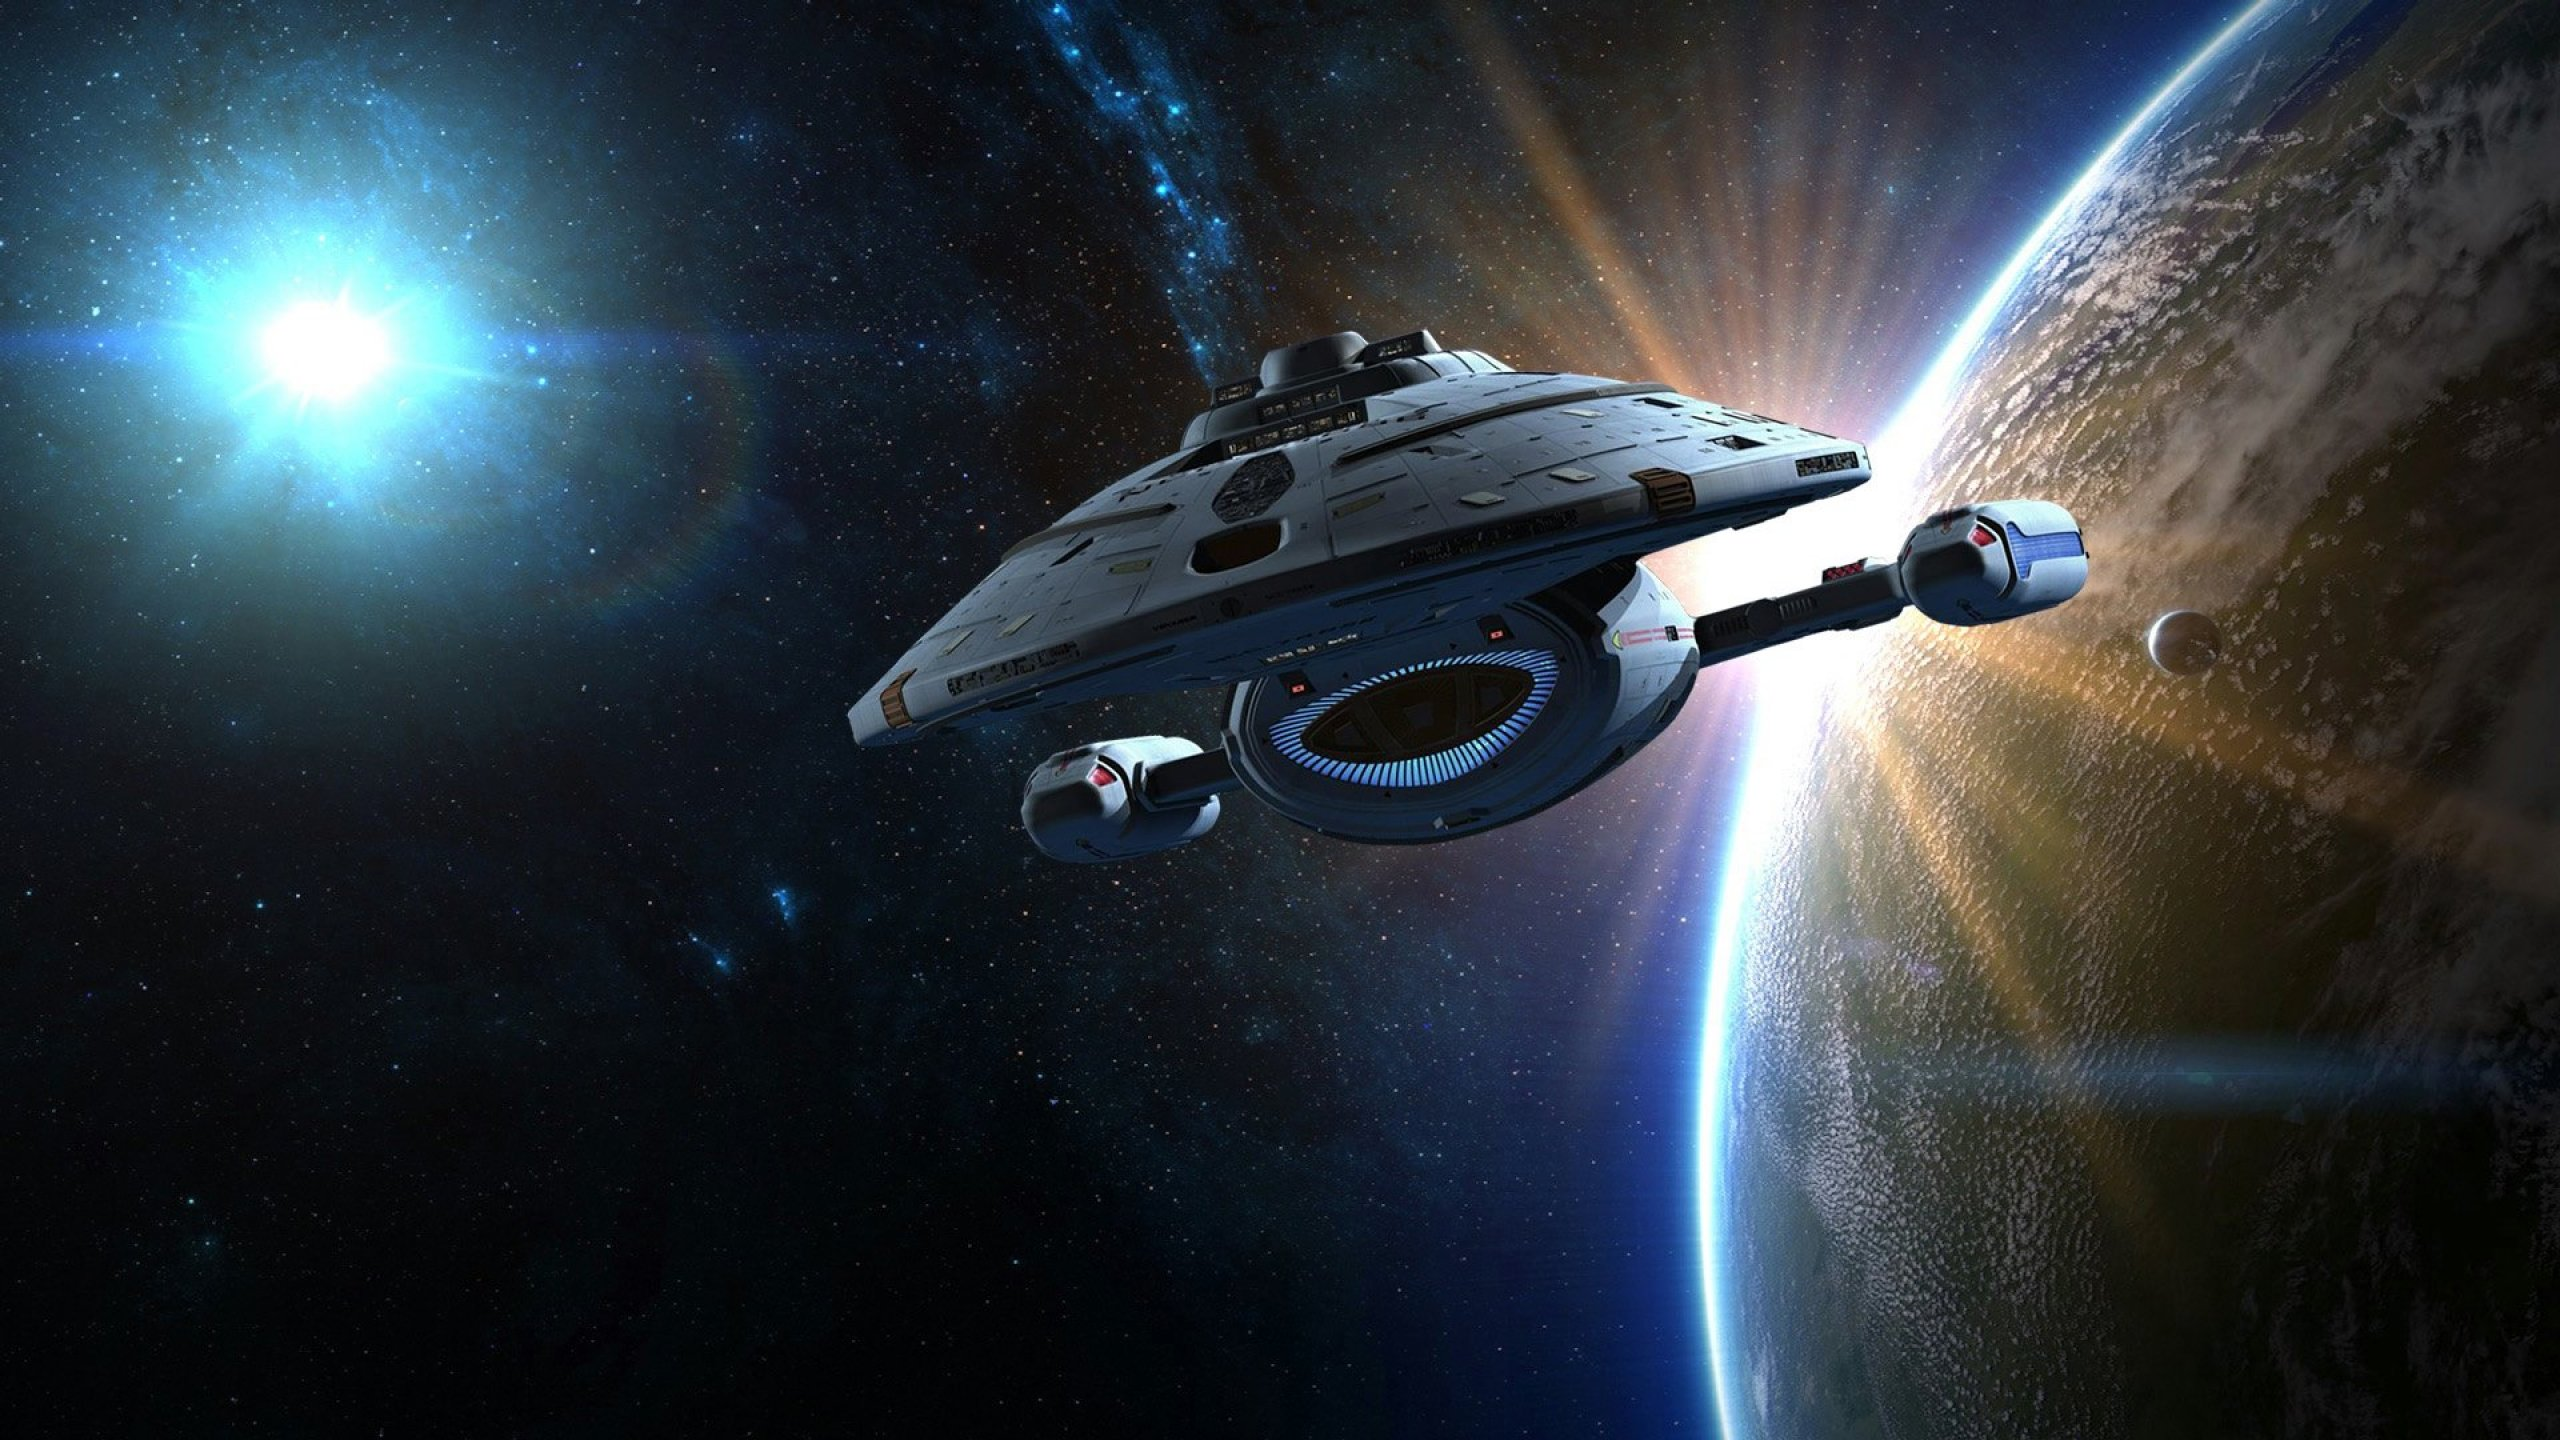 Sci Fi Wallpaper 2560x1440: STAR TREK Futuristic Action Adventure Sci-fi Space